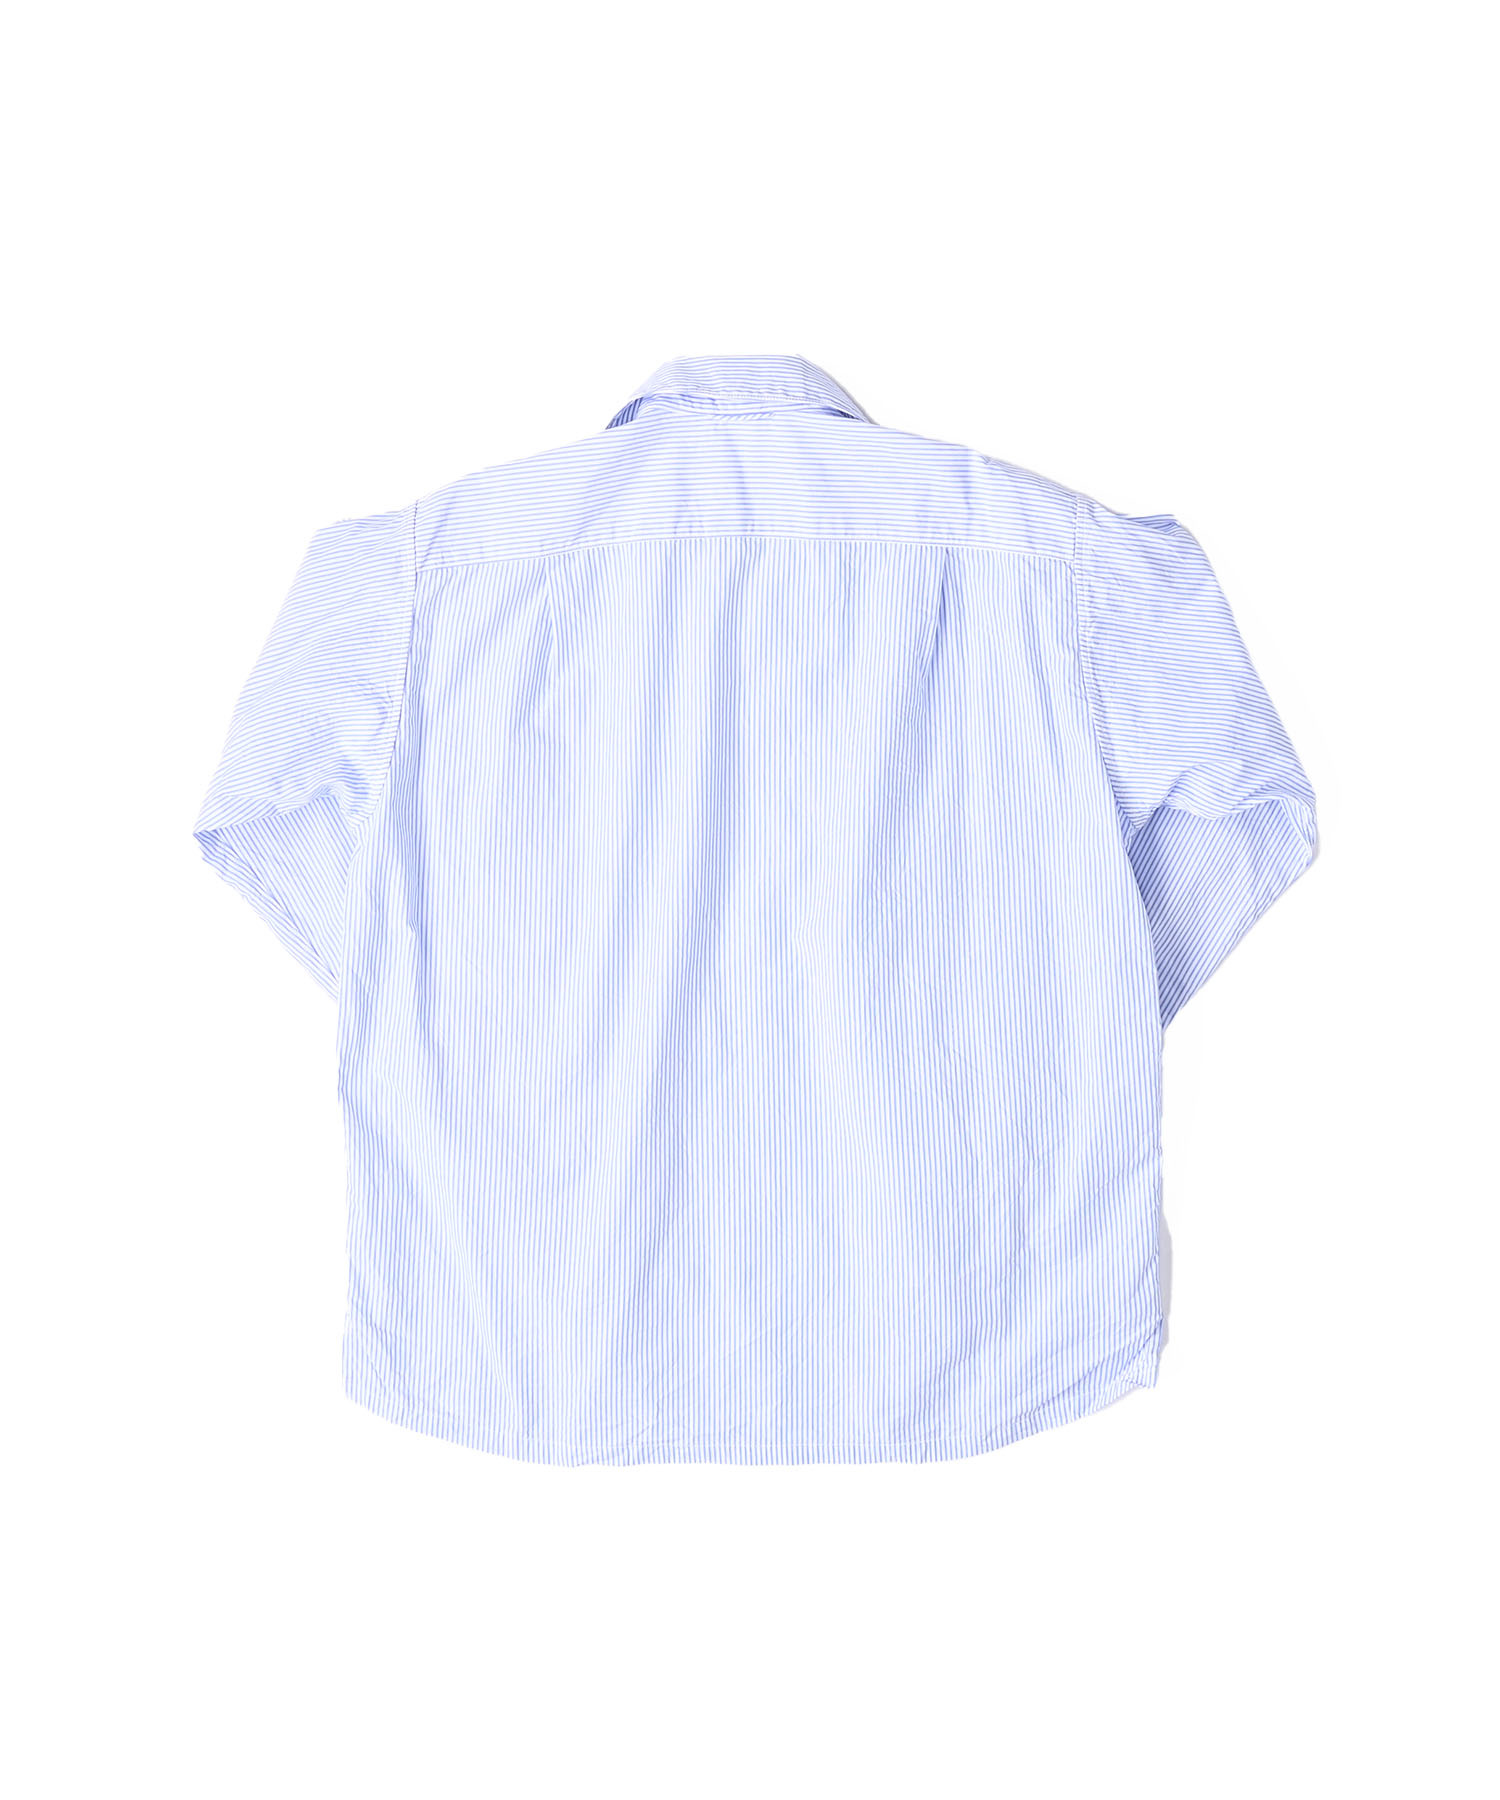 Damp Yarn Dyed 908 Ocean Pullover Shirt (0421)-7